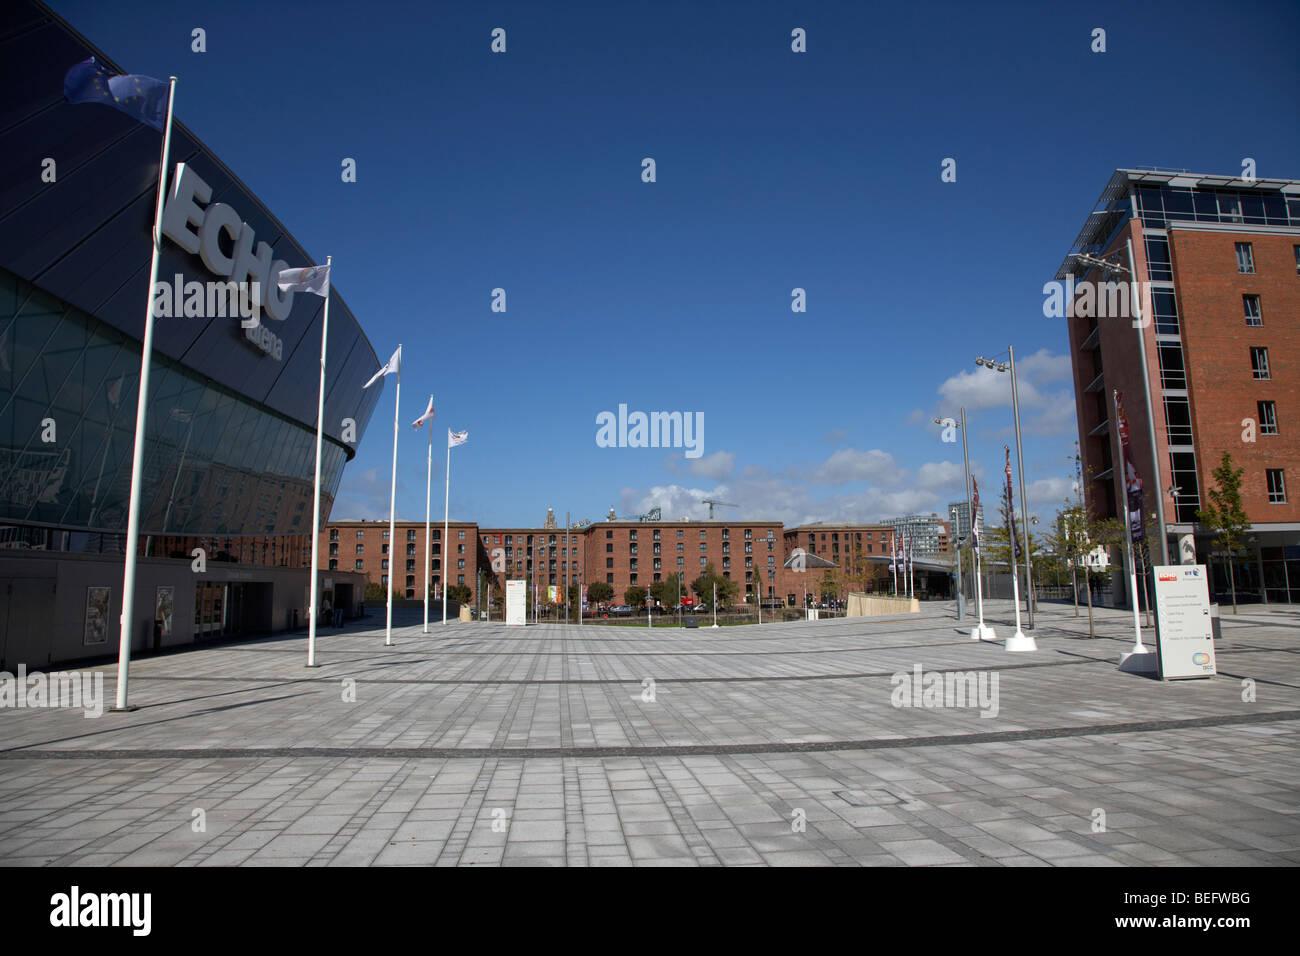 liverpool echo arena and jurys inn hotel liverpool kings waterfront merseyside england uk - Stock Image